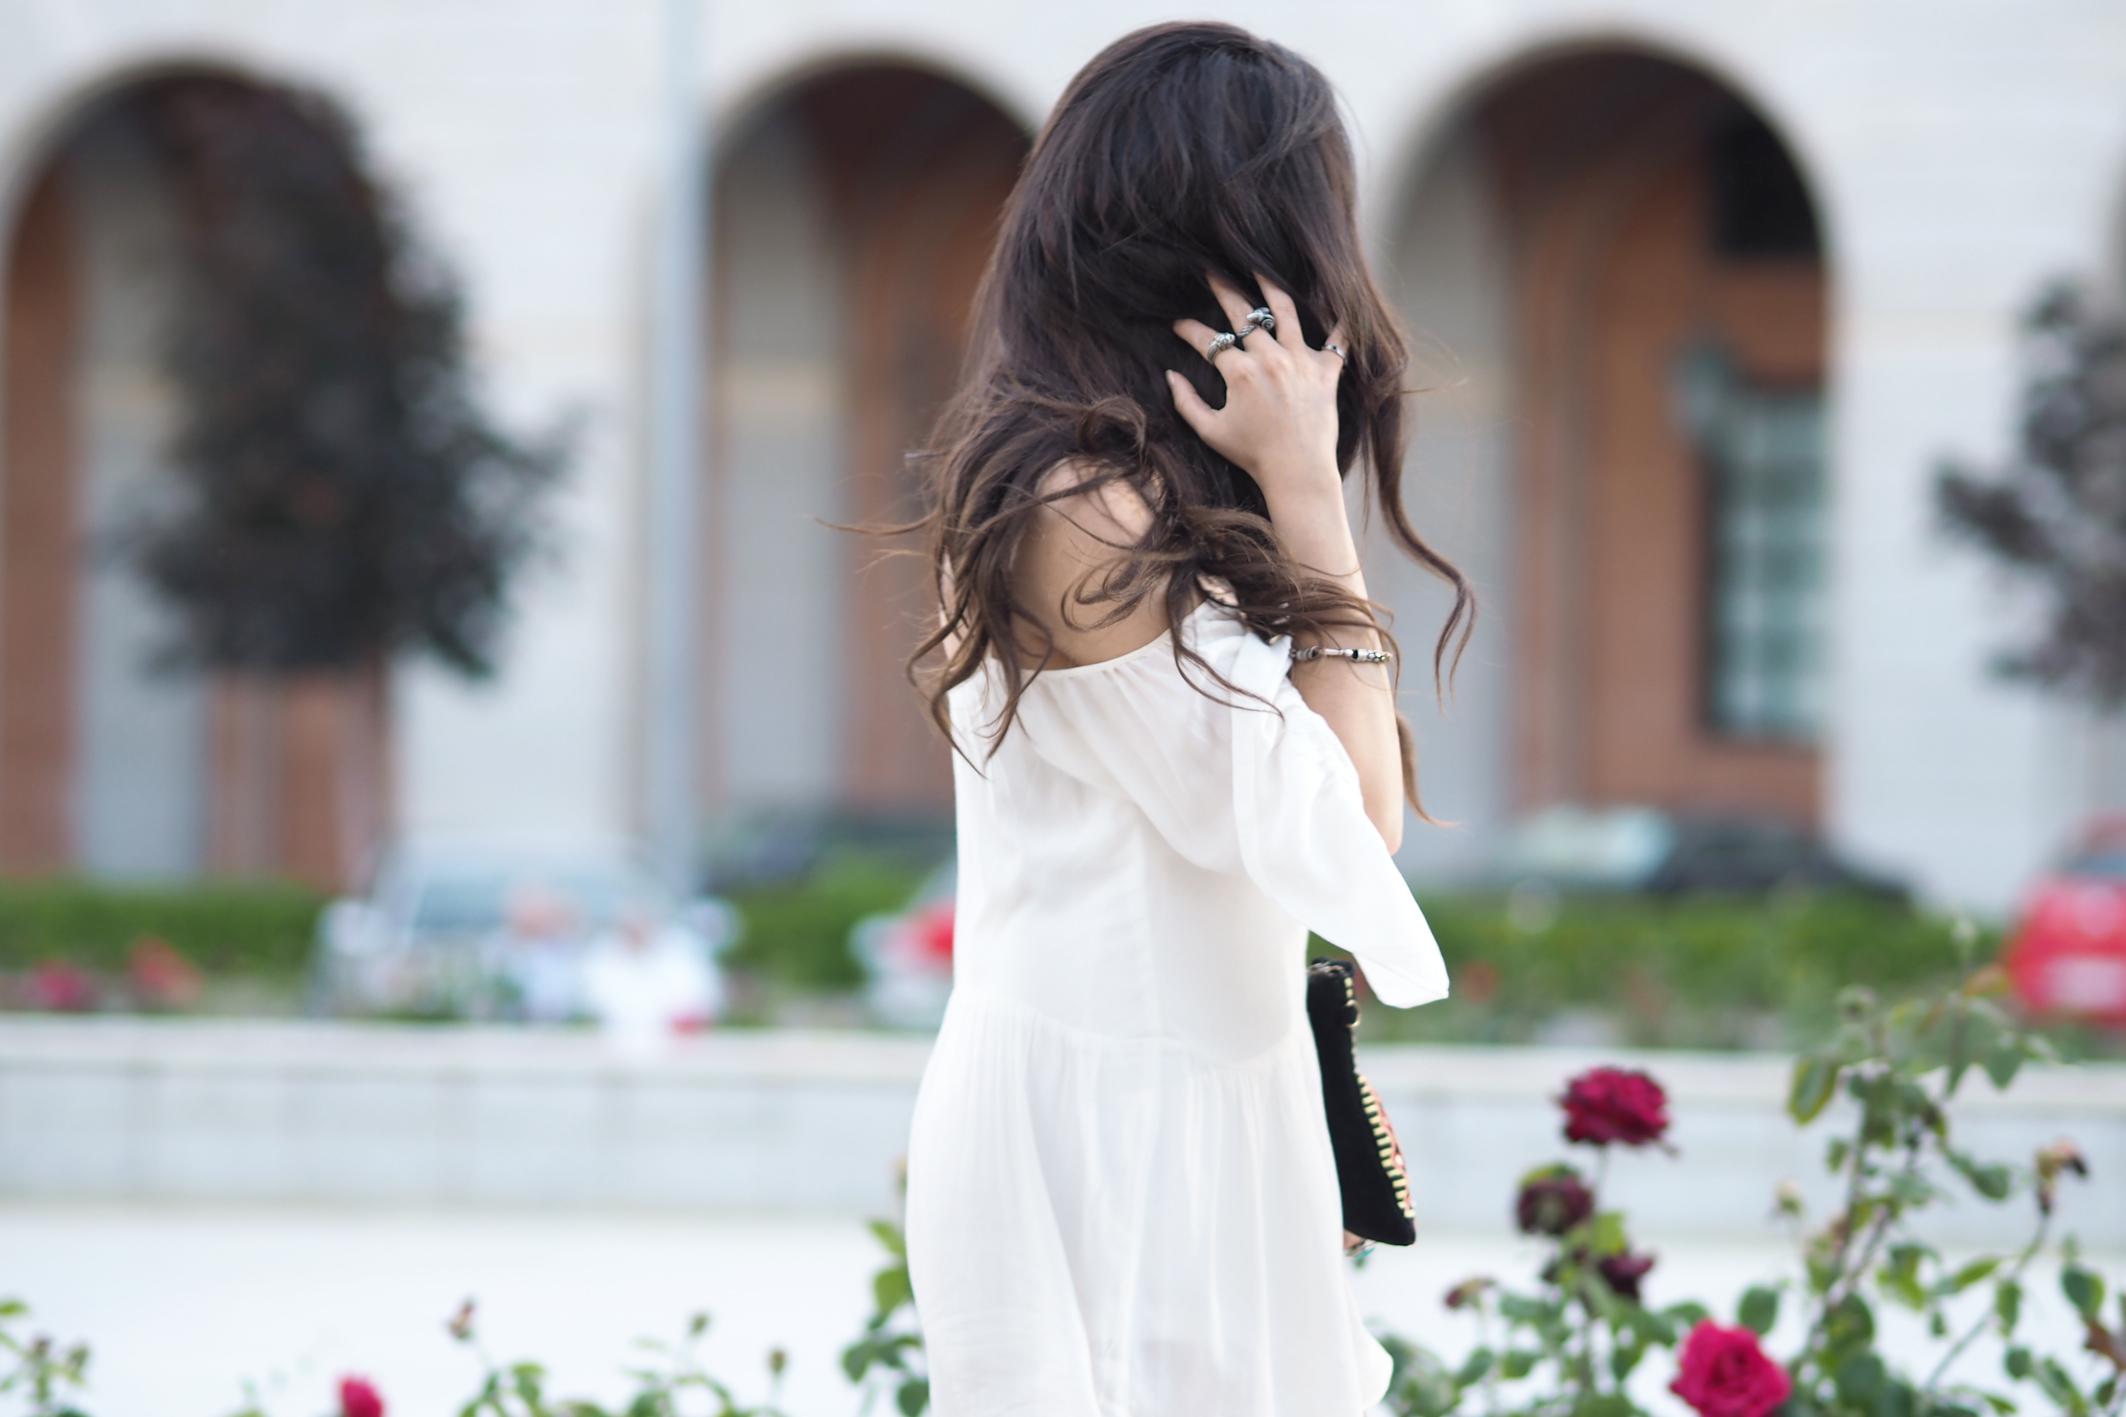 Street style, denim jacket, summer outfit, white jumpsuit, red bandana,